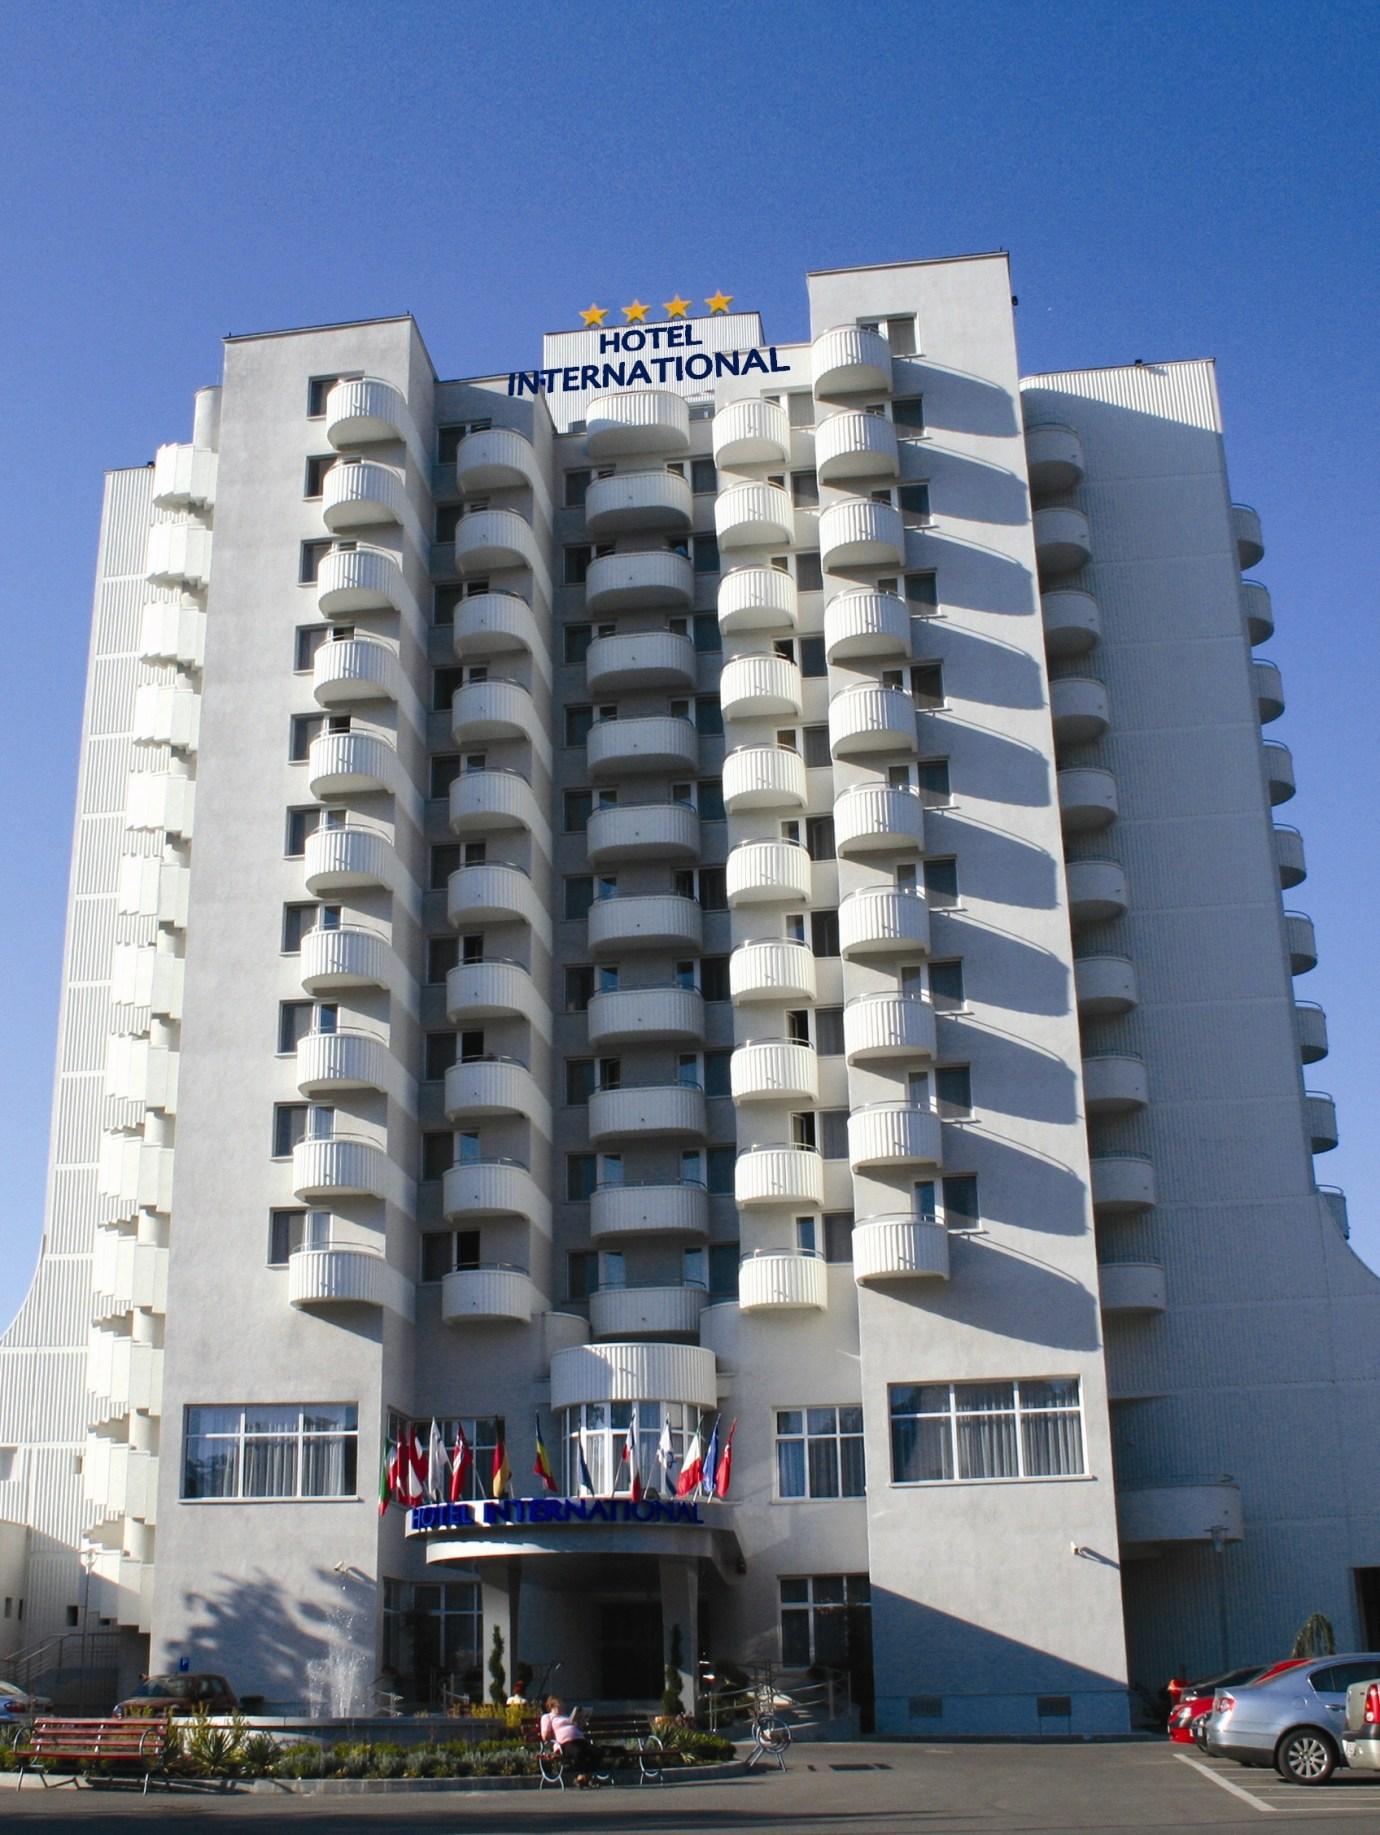 hotel international in romania